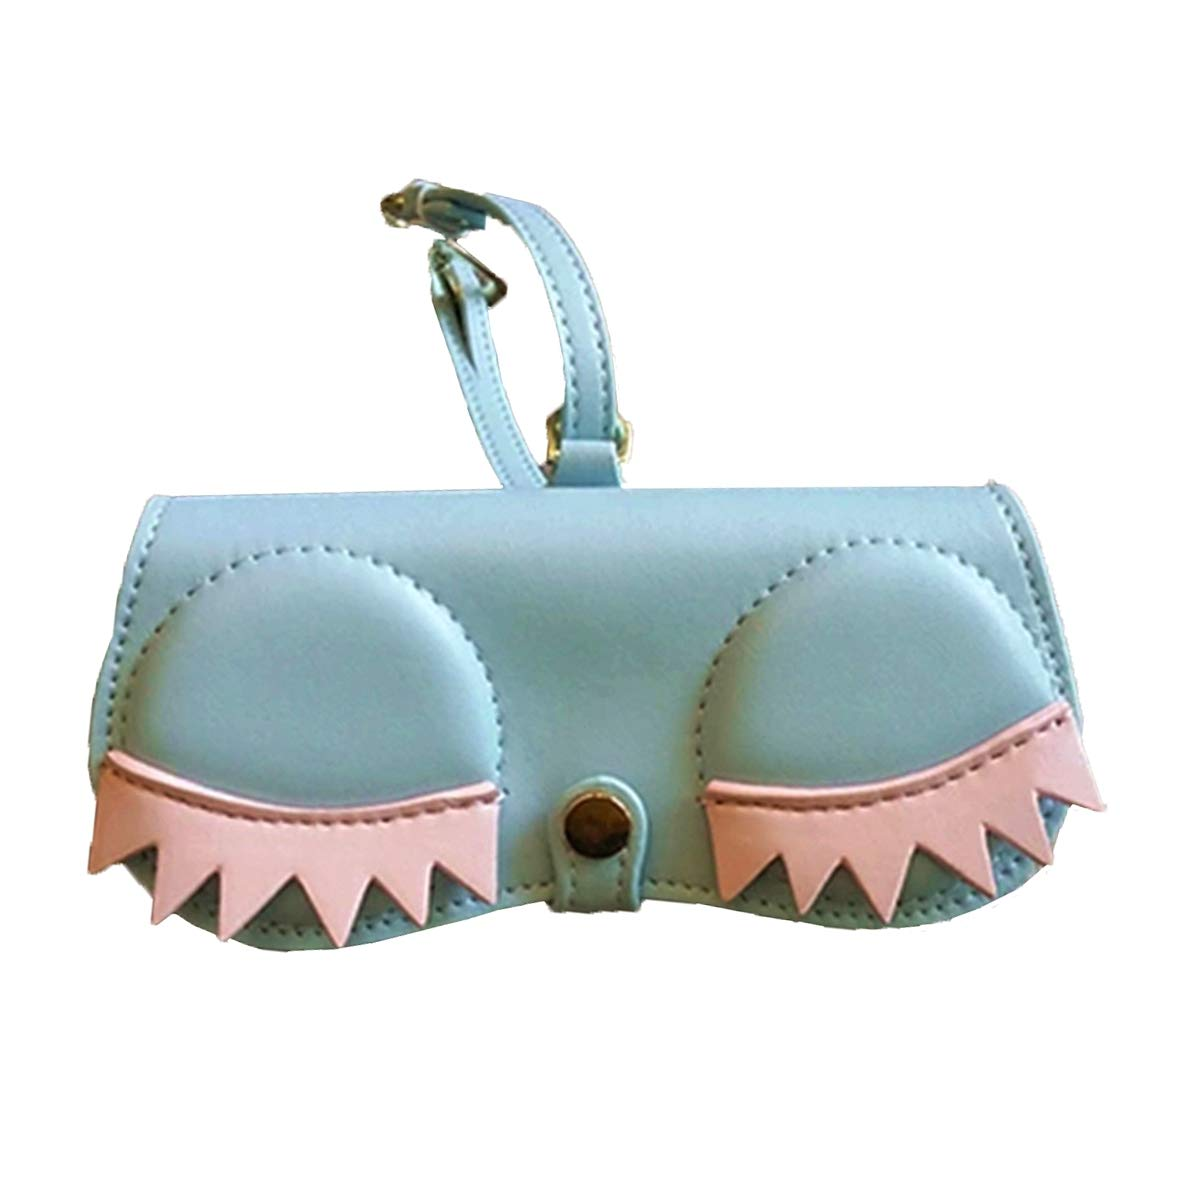 bluee Eyelash Poppow Women's Handmade Sunglasses Case, Cute Leather Eyeglasses Case Bag Keychain Charm Decoration Pendant Gift Accessory